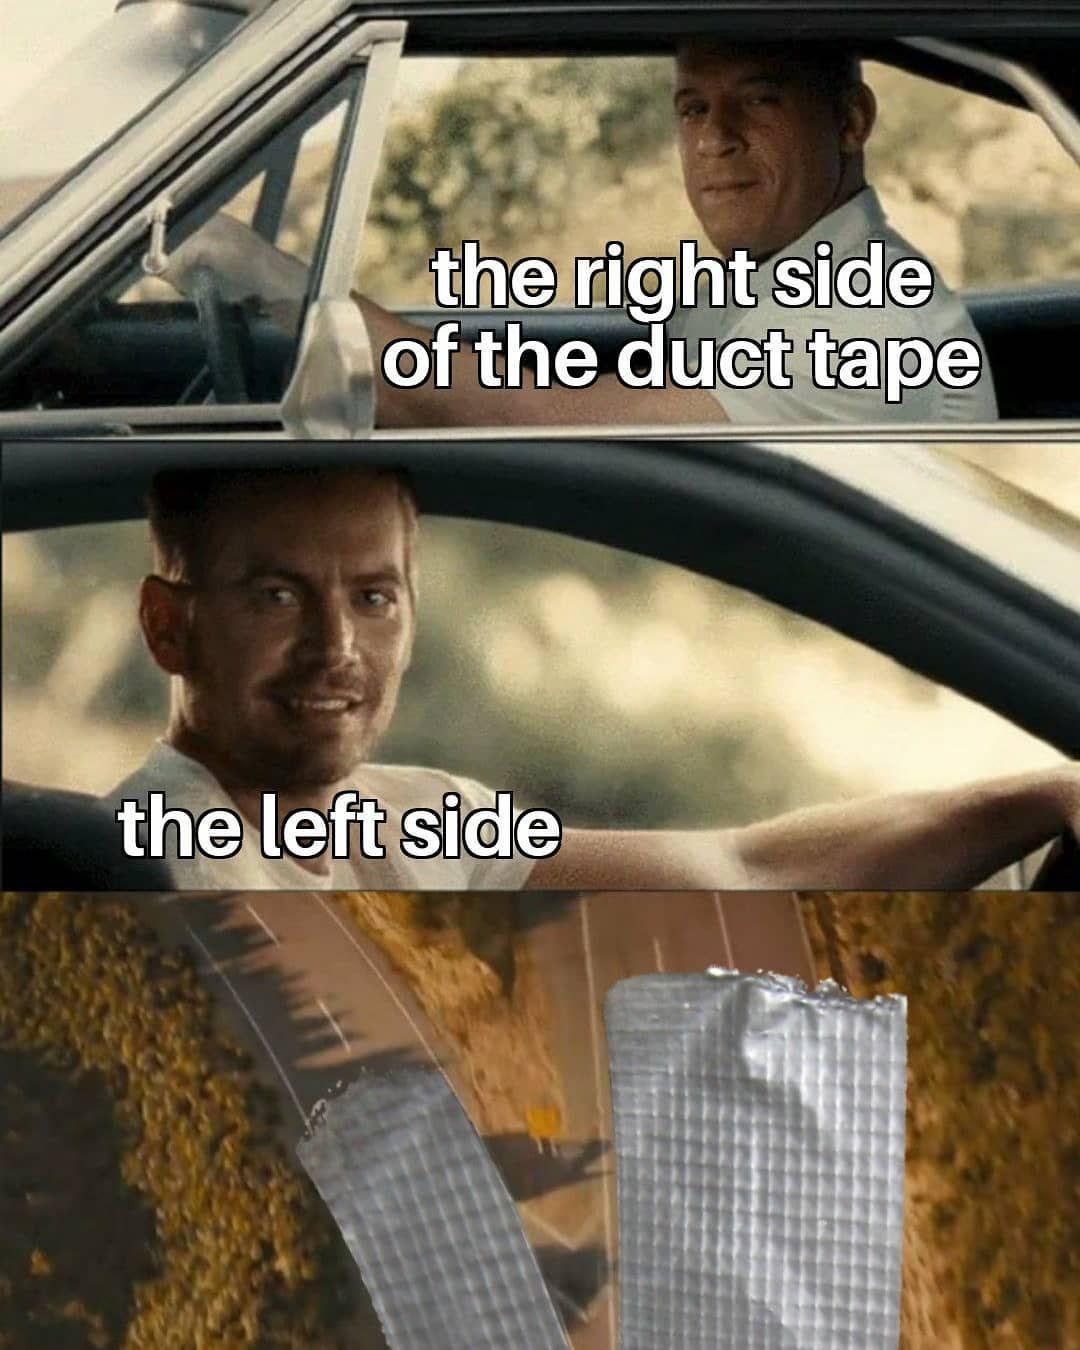 Follow Icebreaker Memes For More Meme And Check Out Our Social Mobile Game Memes Meme Funny Fun Memesdaily Dan Funny Memes Top Memes Memes